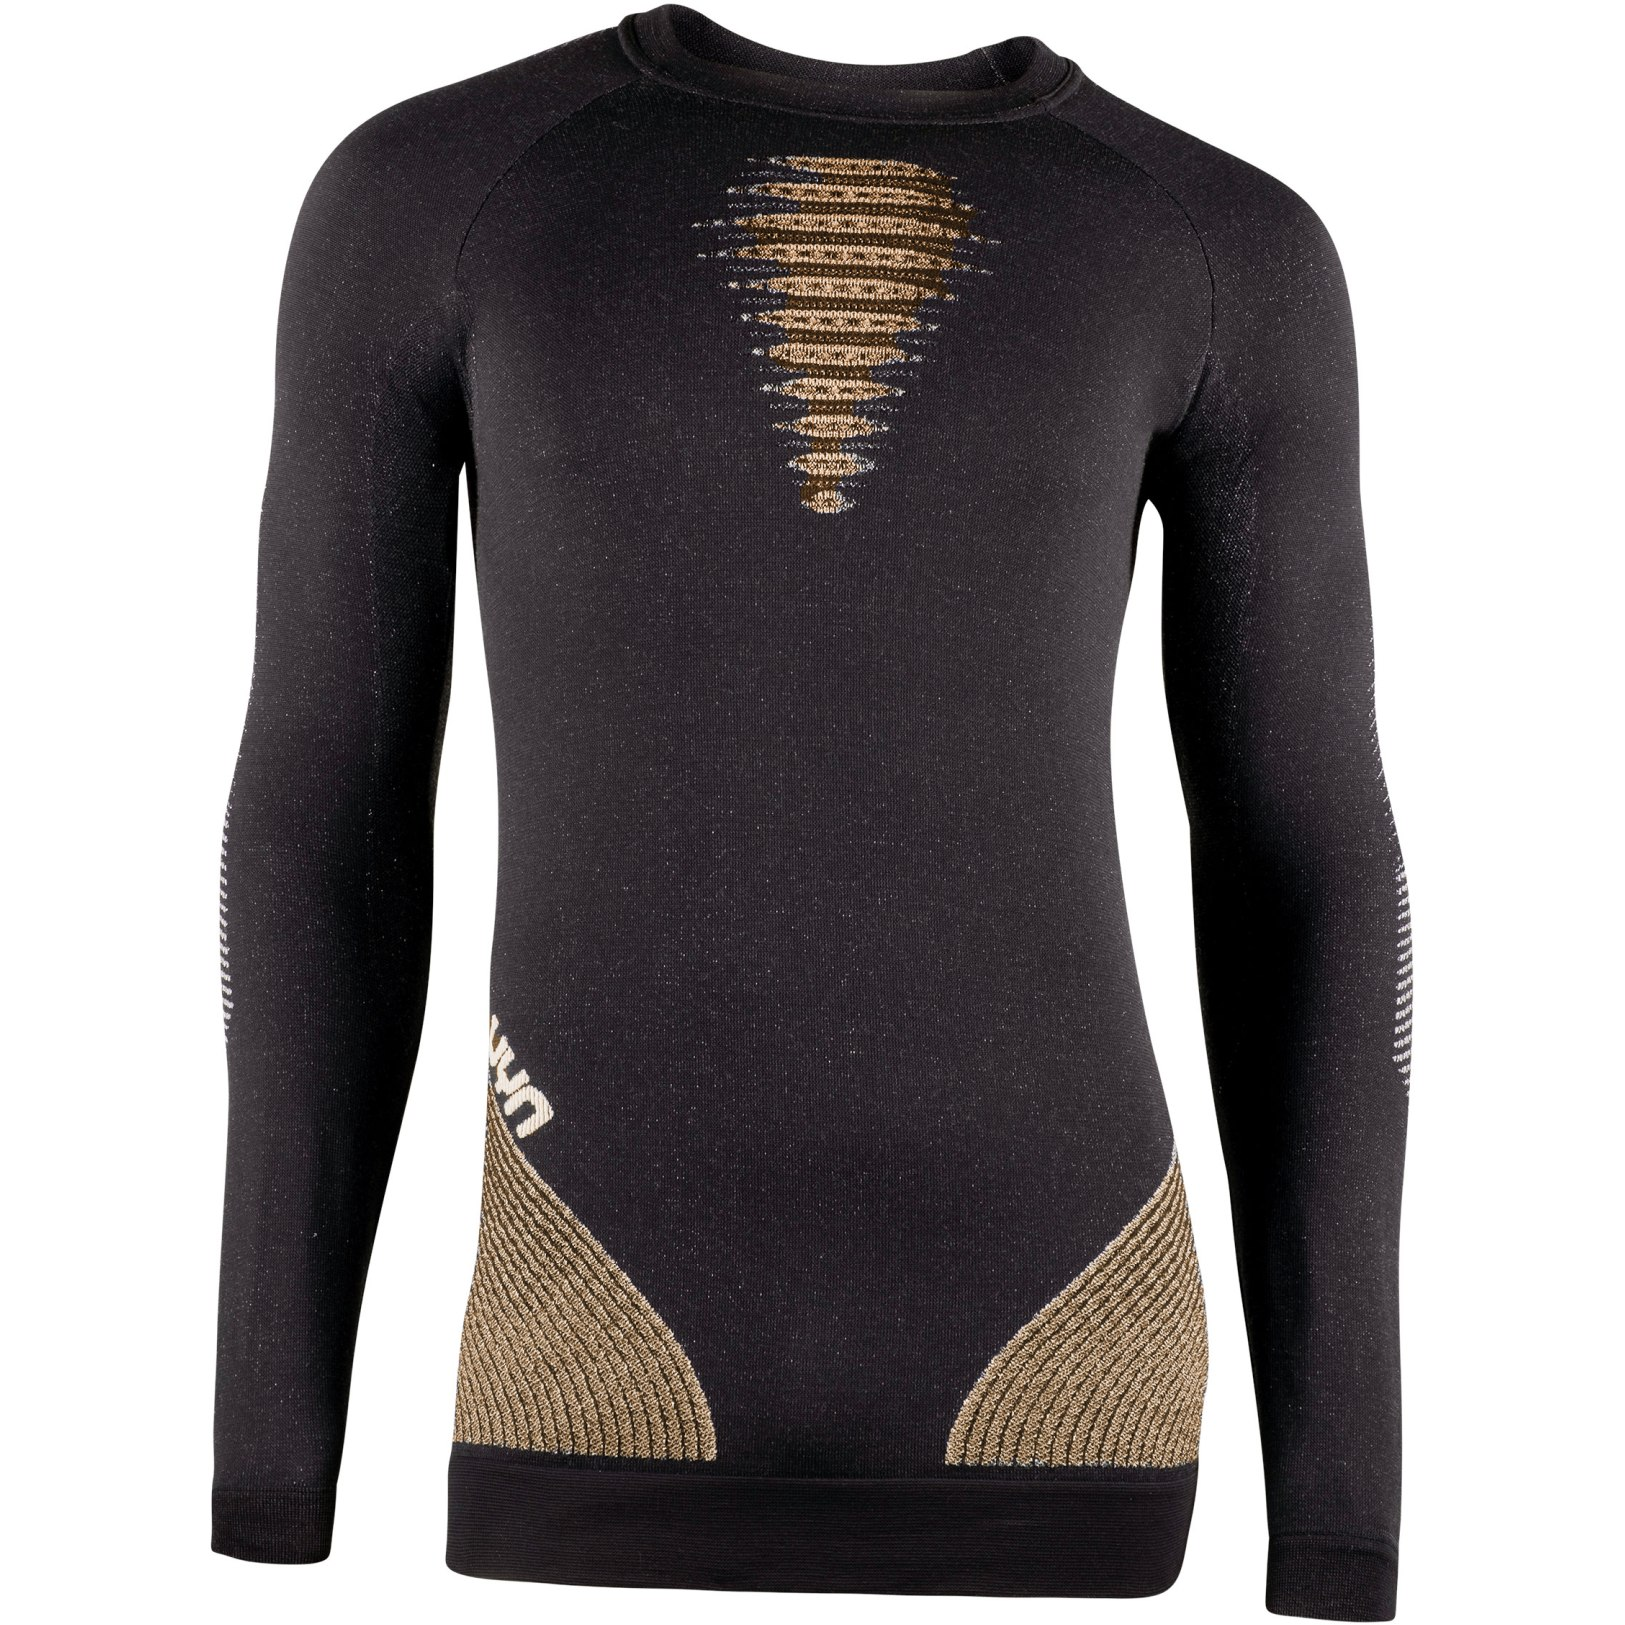 UYN Cashmere Shiny 2.0 Man Underwear Shirt Long Sleeves Round Neck - Celebrity Gold